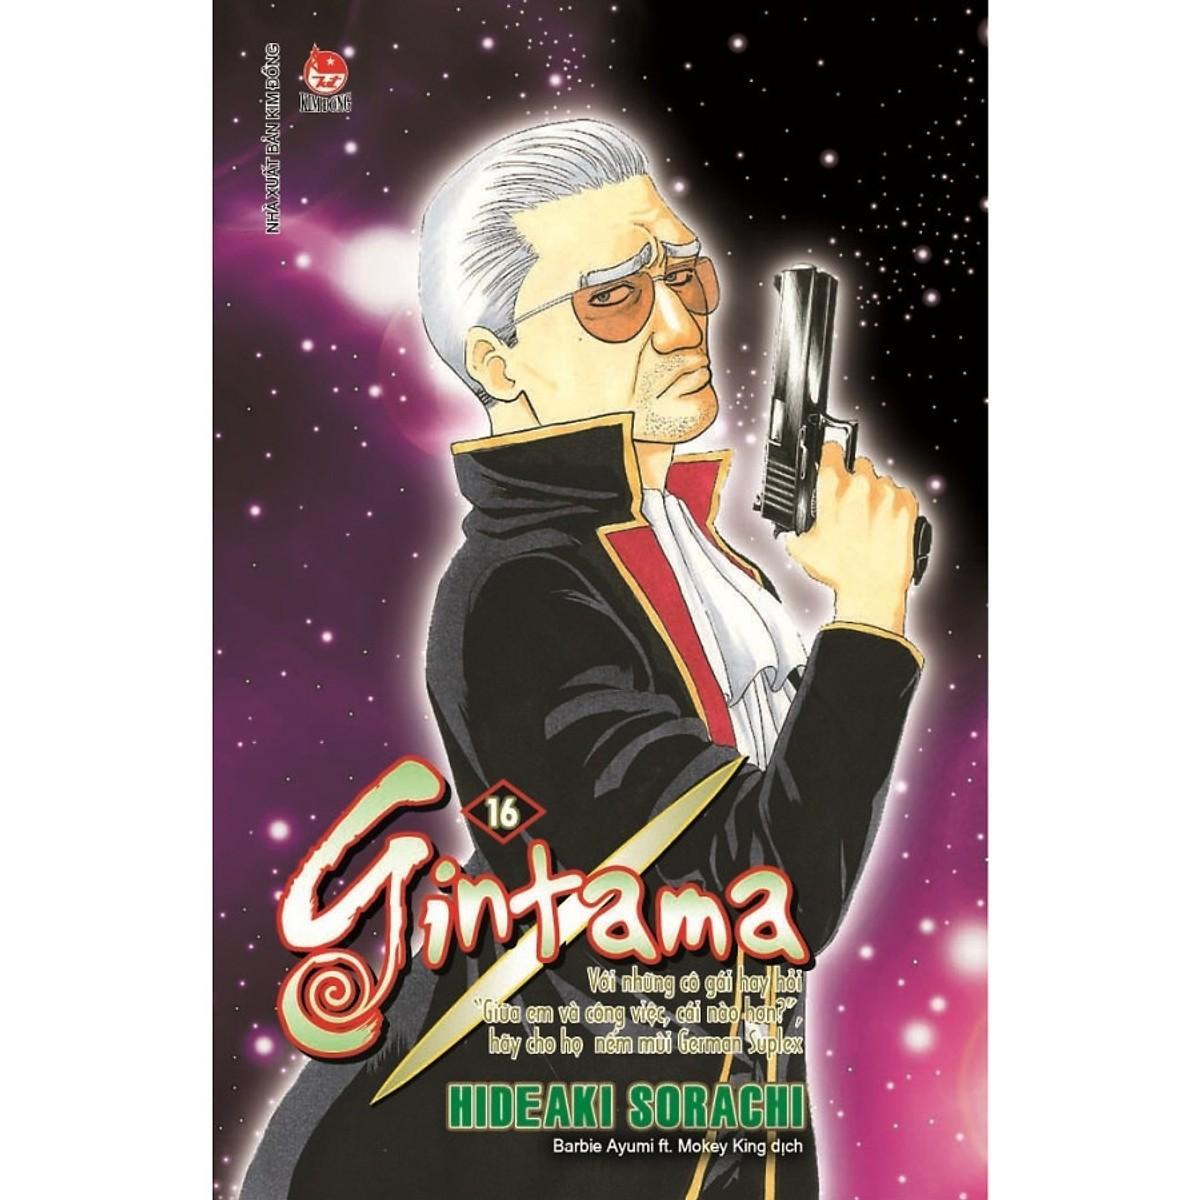 Mua Gintama (Tái bản) – Tập 16